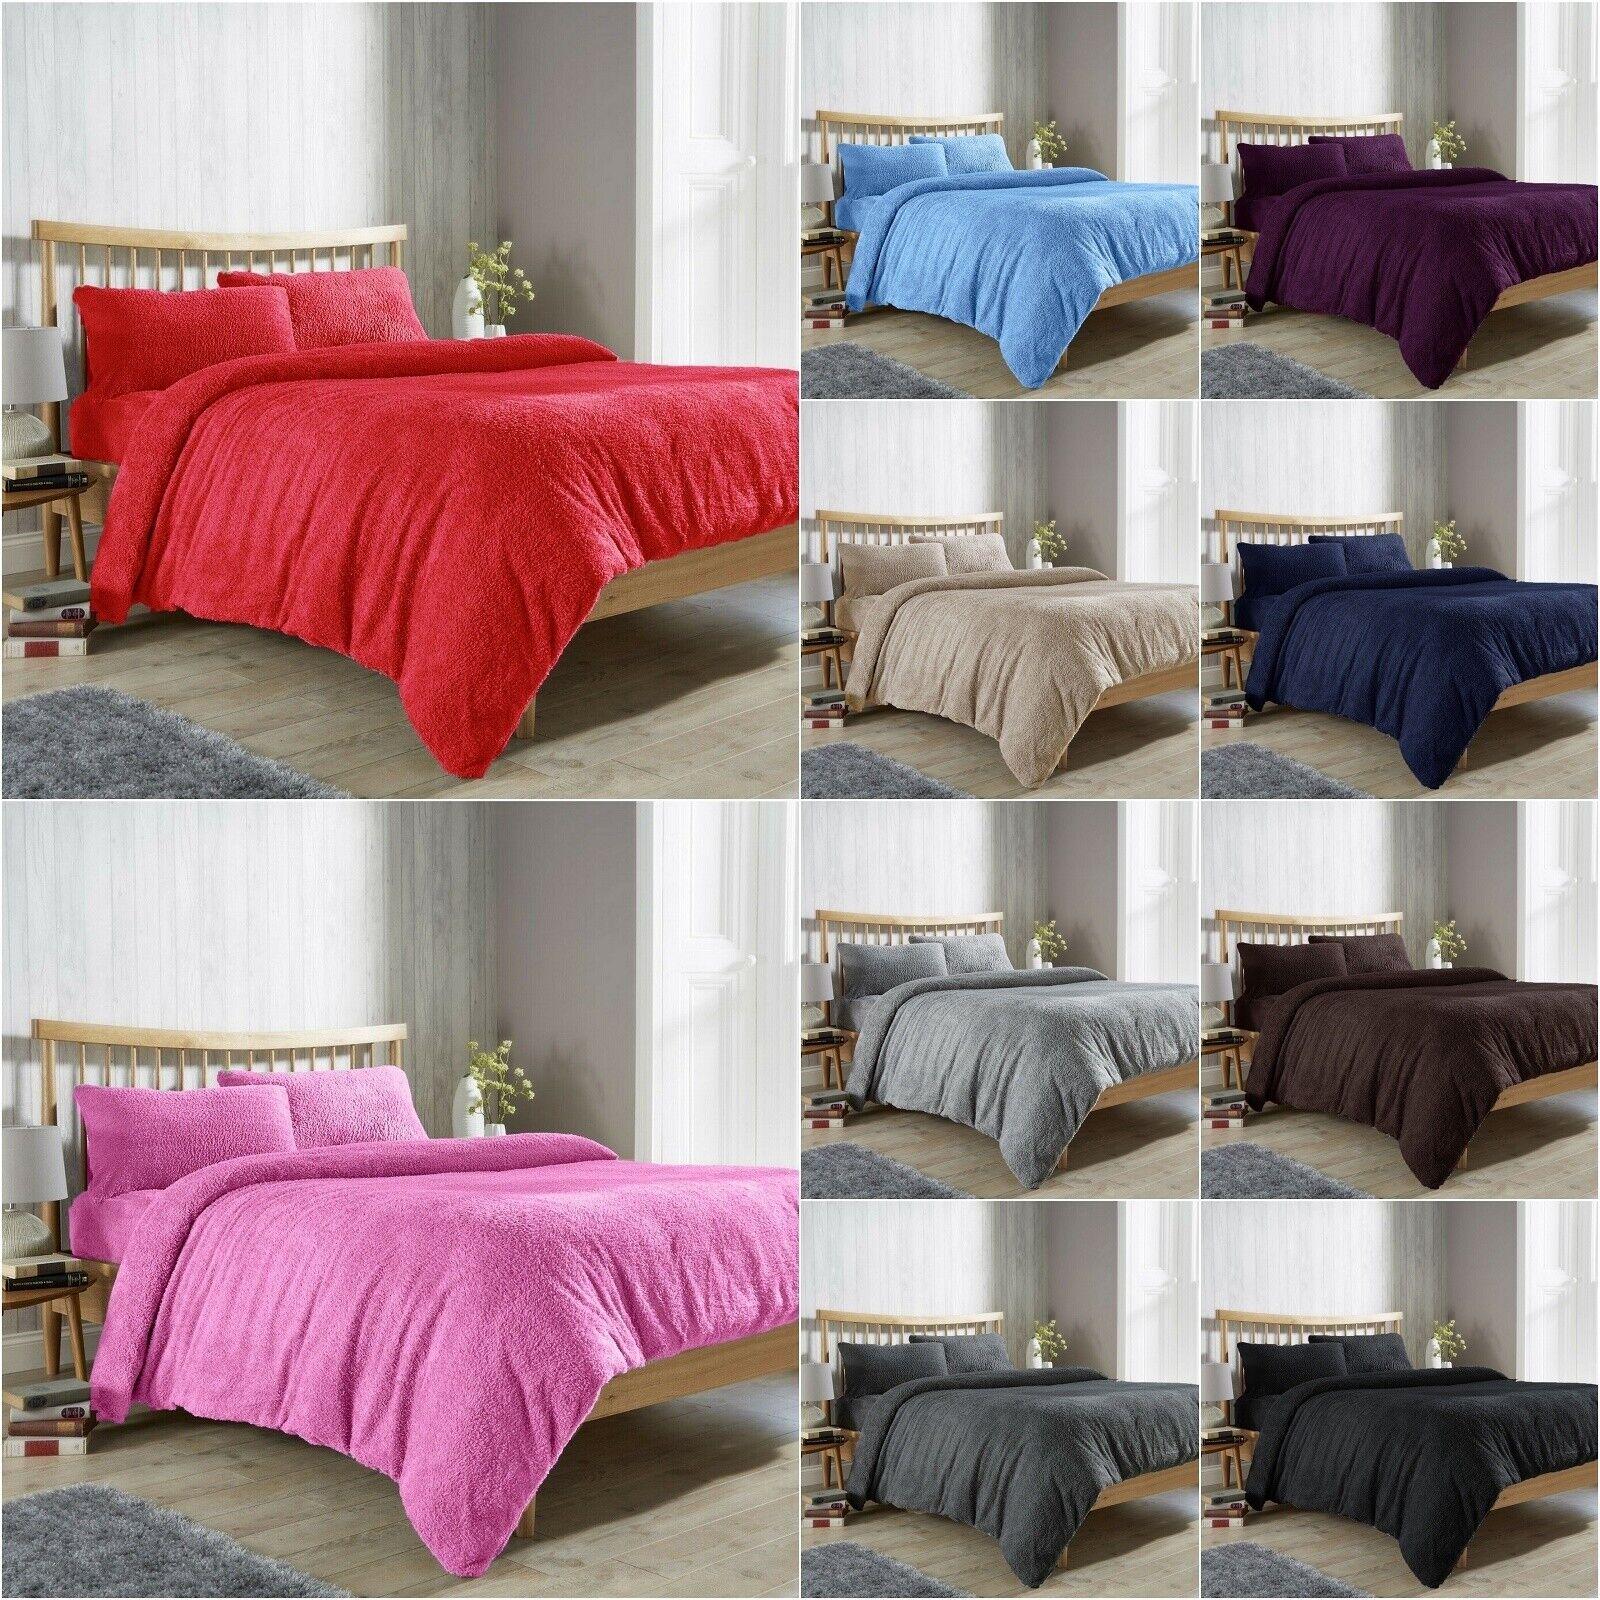 Warm Fleece TEDDY BEAR Duvet Cover Set Pillowcase Super Soft All Sizes 13 COLORS